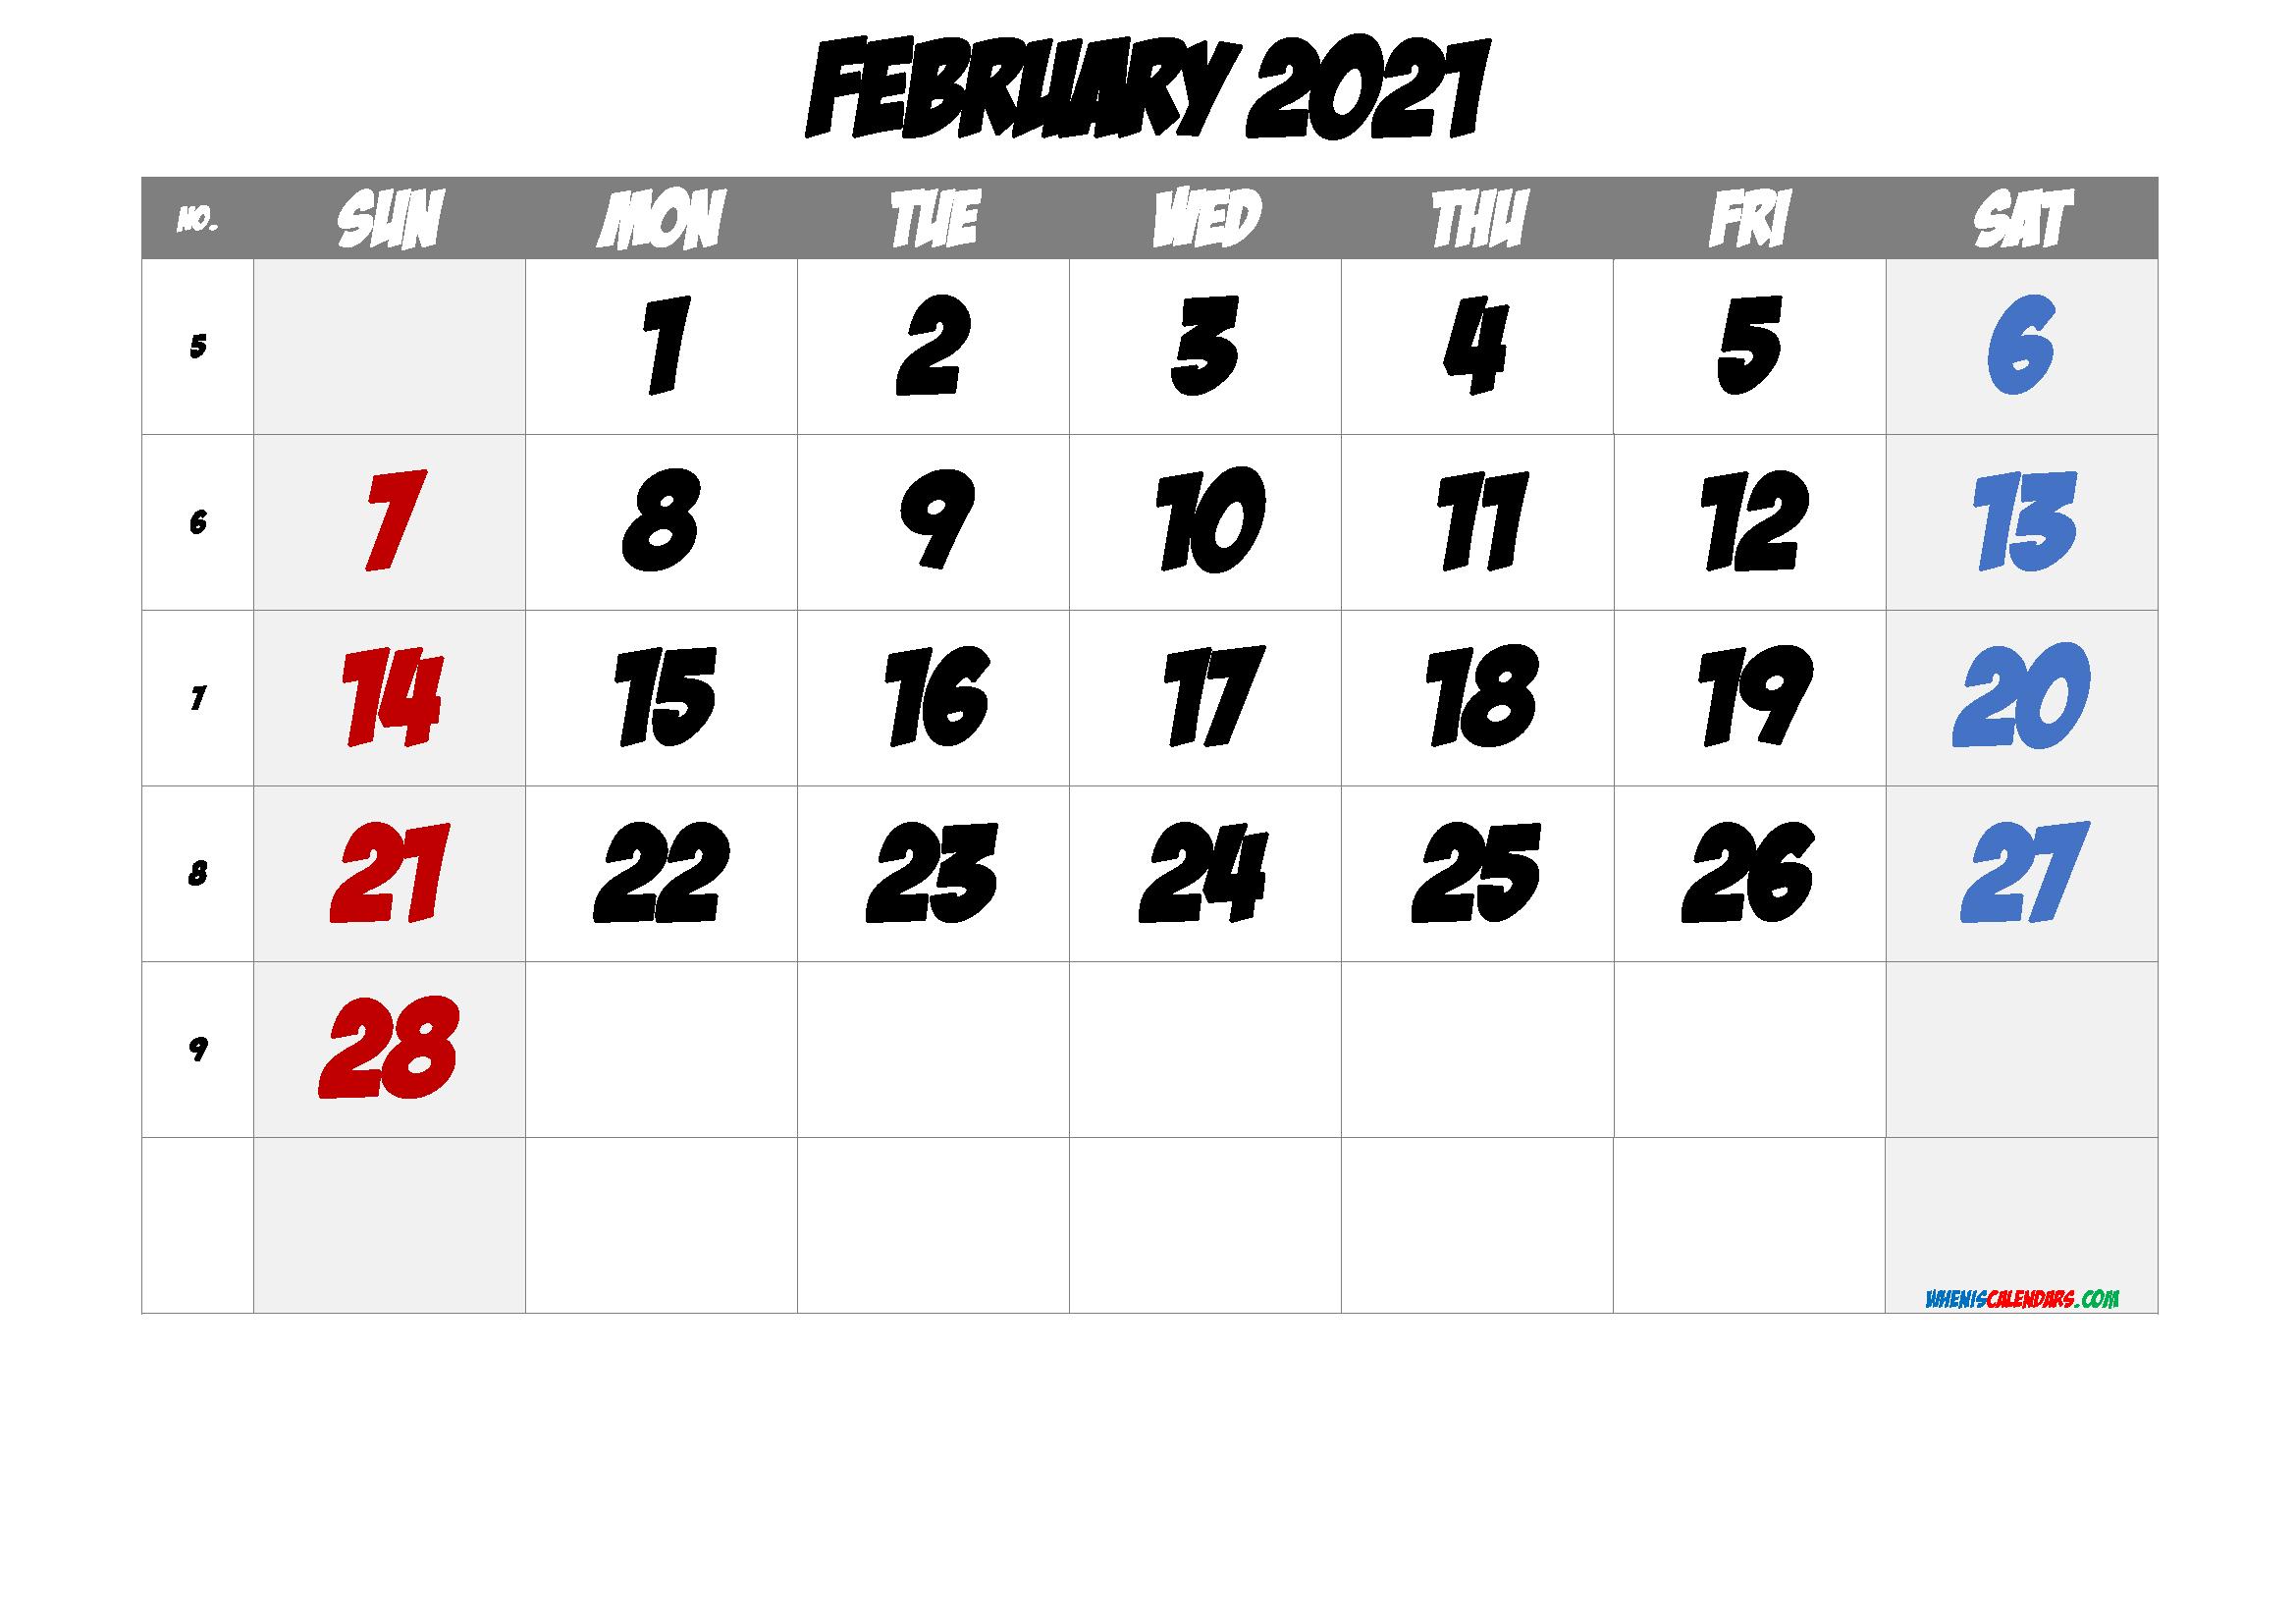 February 2021 Printable Calendar with Week Numbers